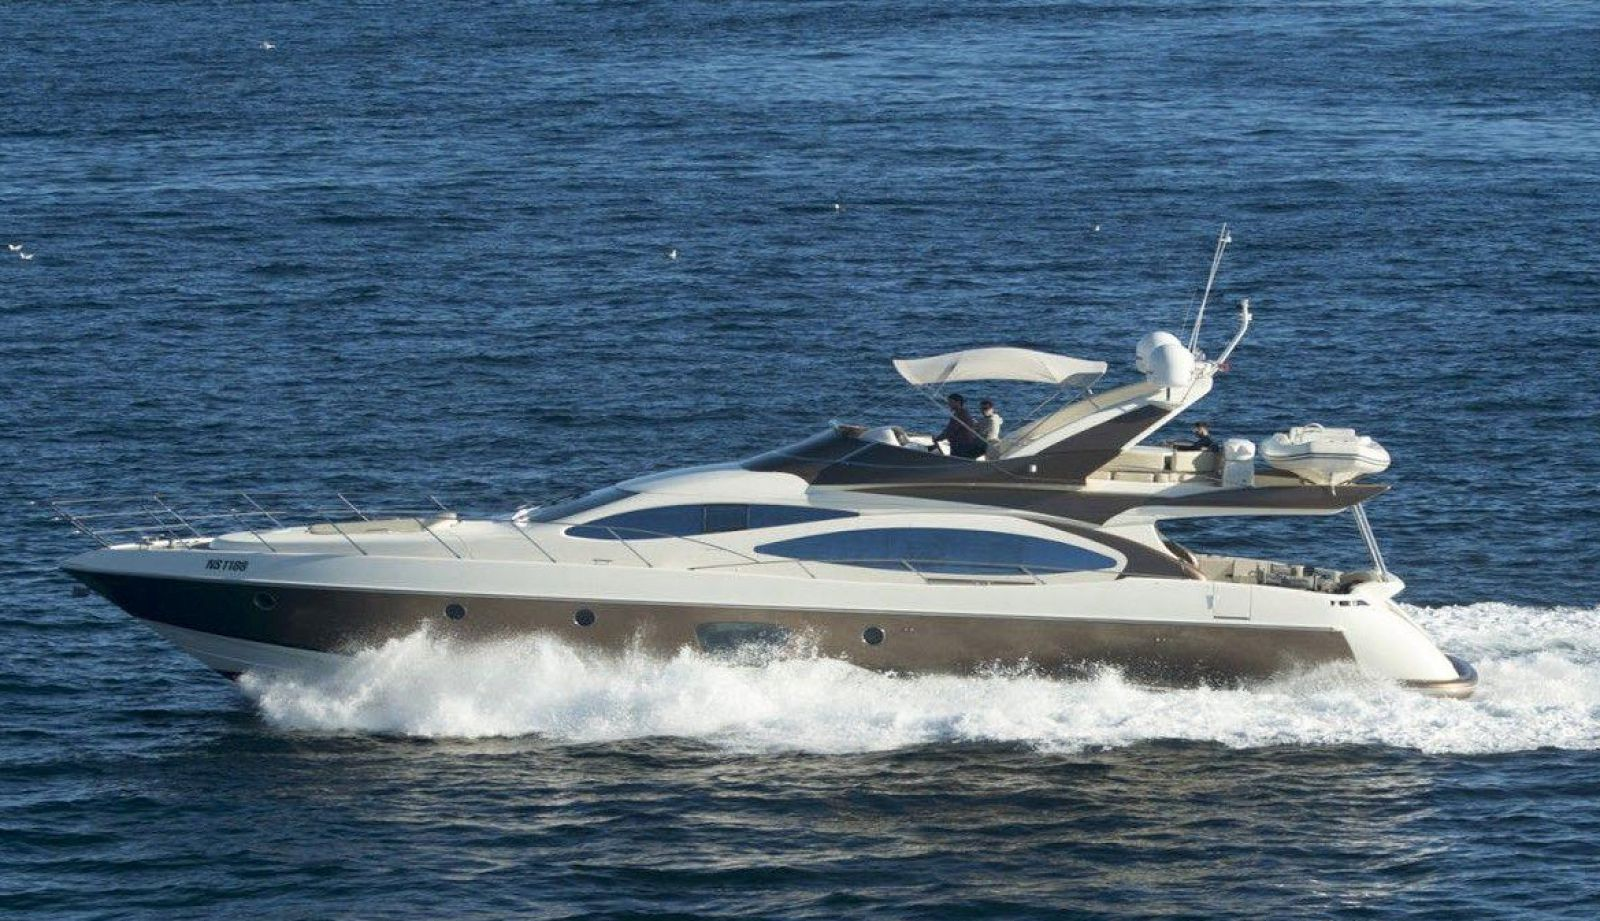 azimut 71 flybridge yacht for sale